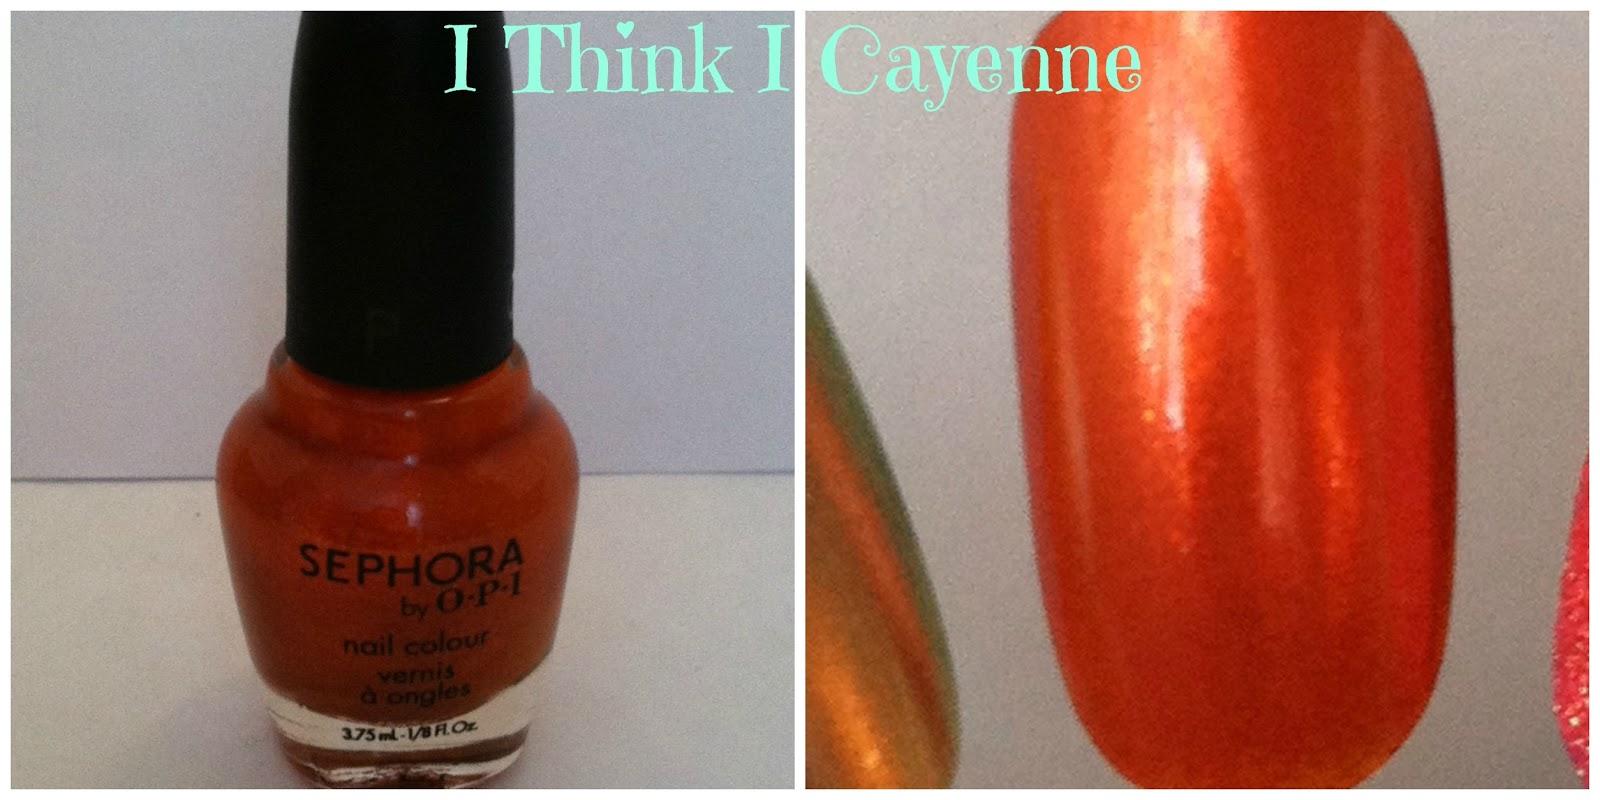 The Beauty DIYer : My O.P.I. Nail Polish Collection